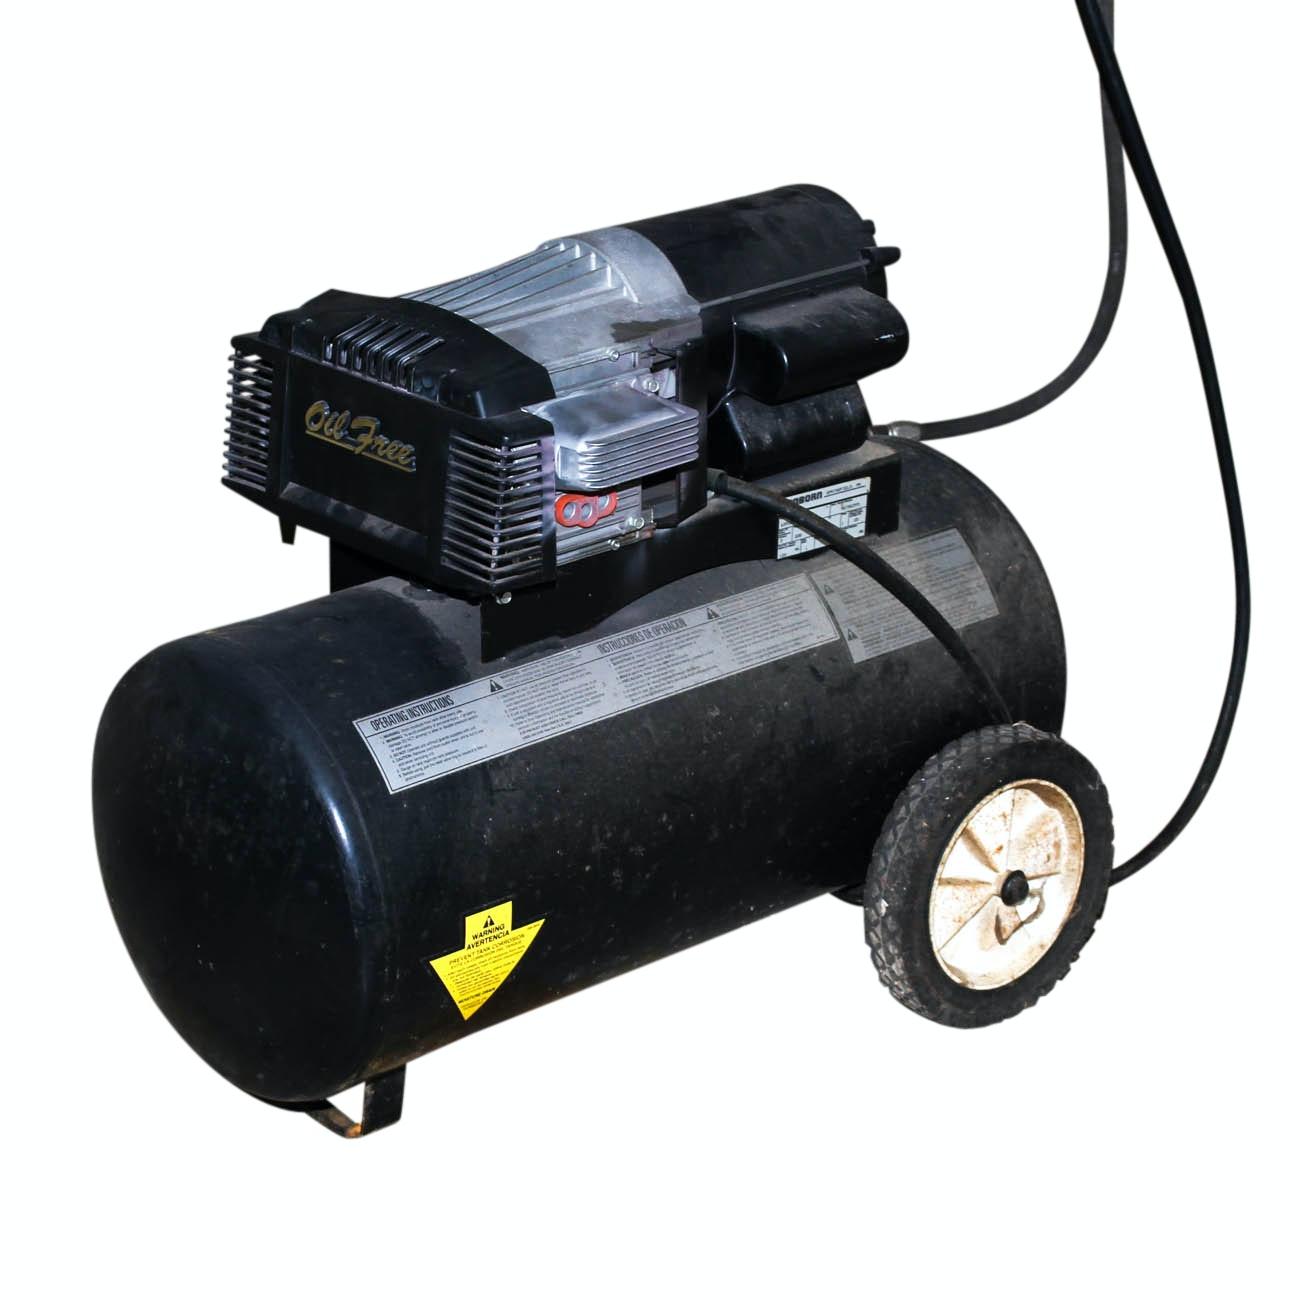 Oil Free Sanborn Black Max Air Compressor